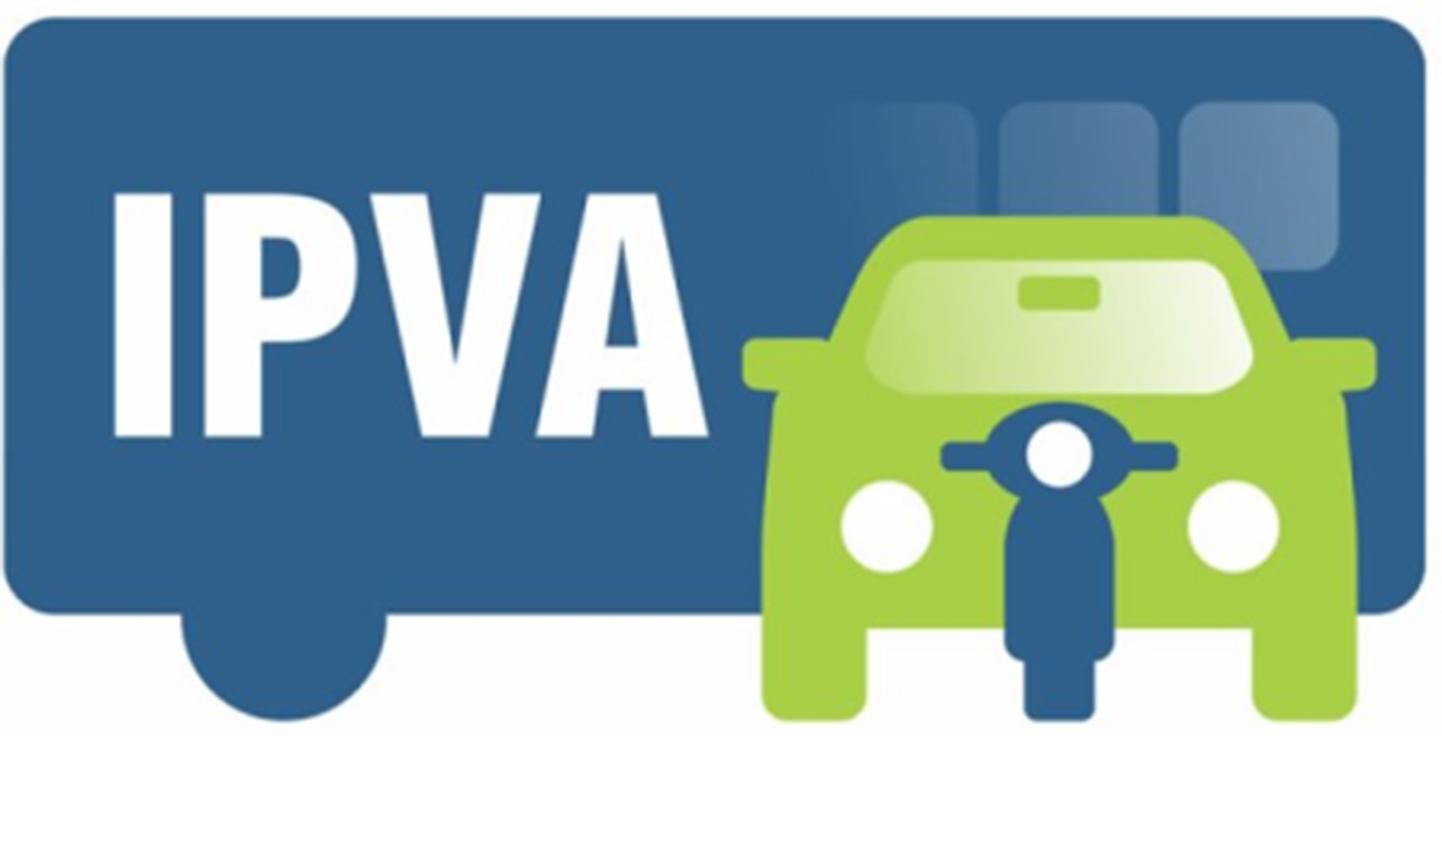 IPVA: veja o que vai mudar